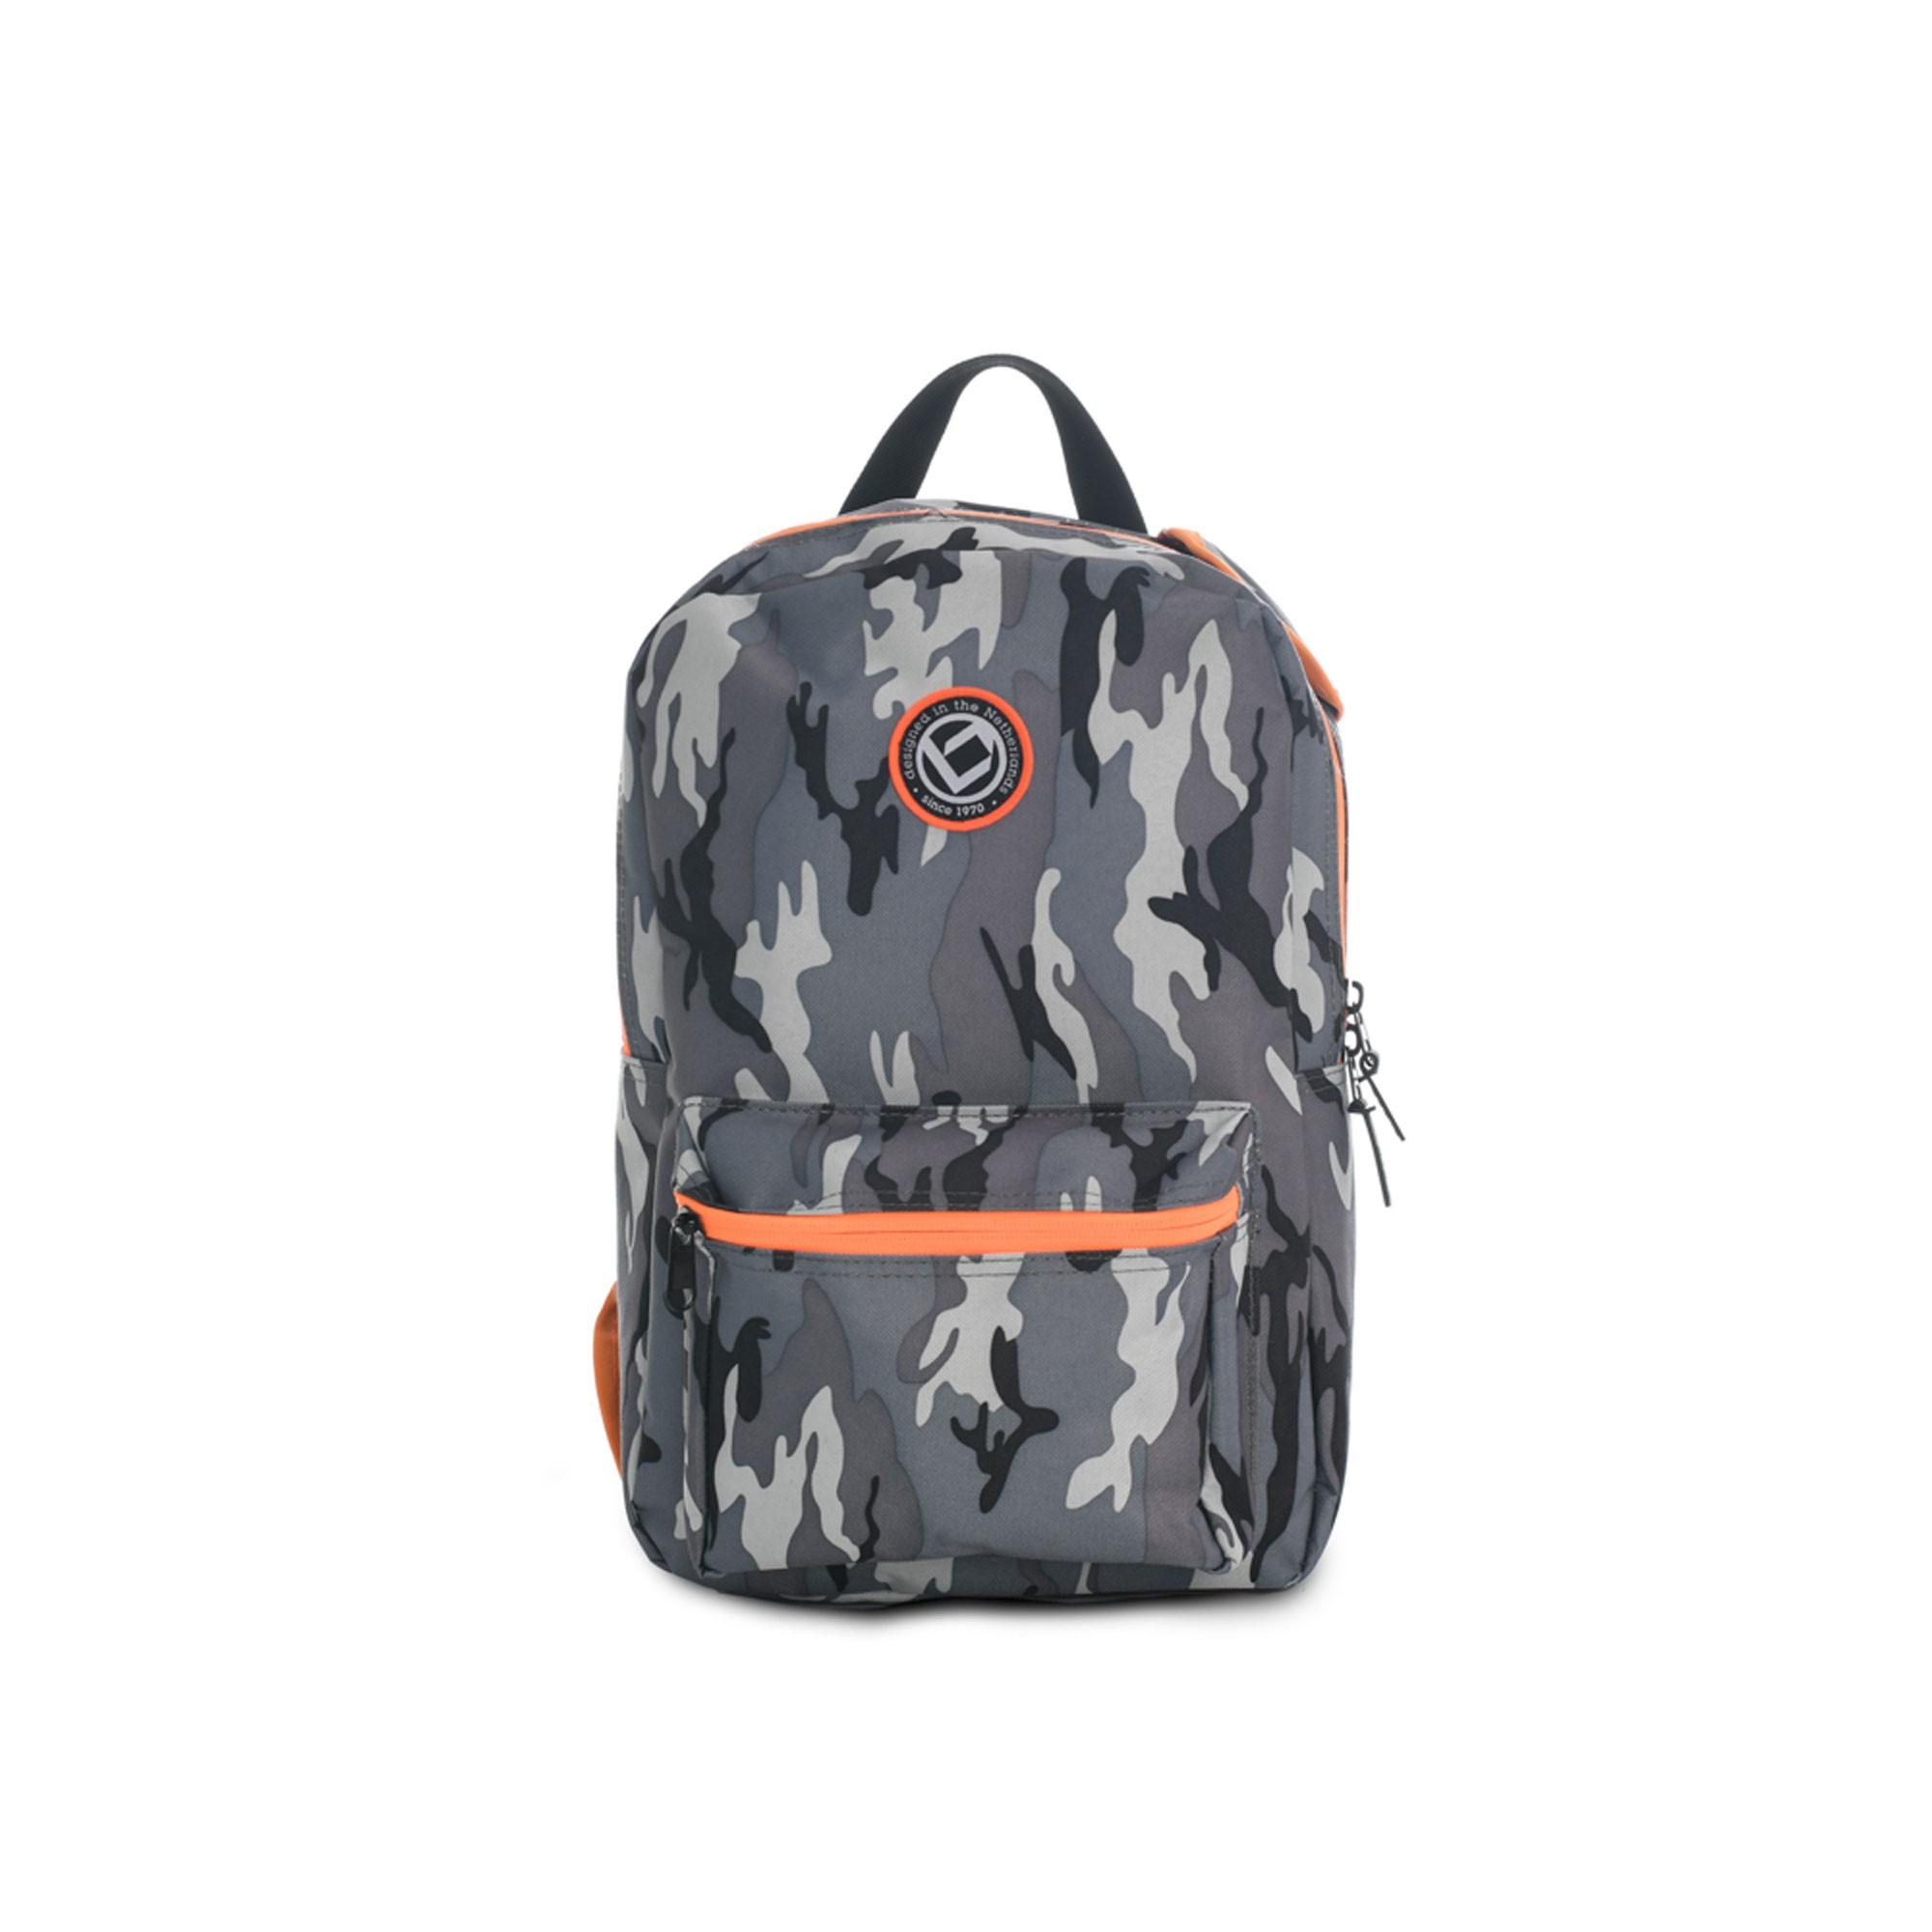 Afbeelding van Brabo Backpack Storm Camo Hockeytas Orange